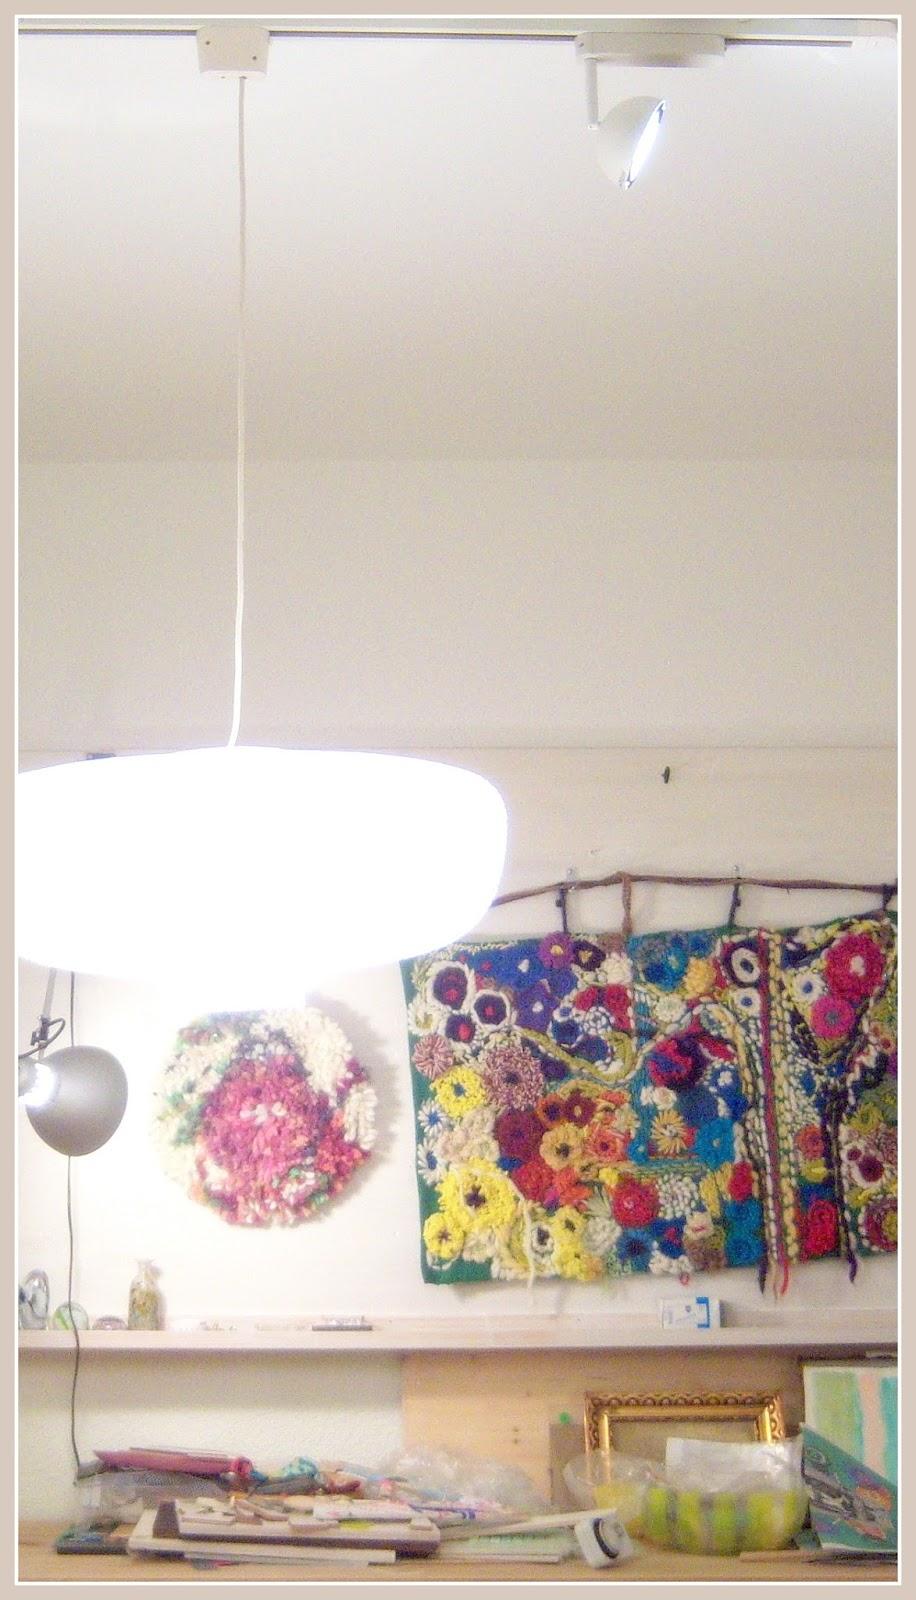 ikea leuchten oder verflixt und verkabelt. Black Bedroom Furniture Sets. Home Design Ideas